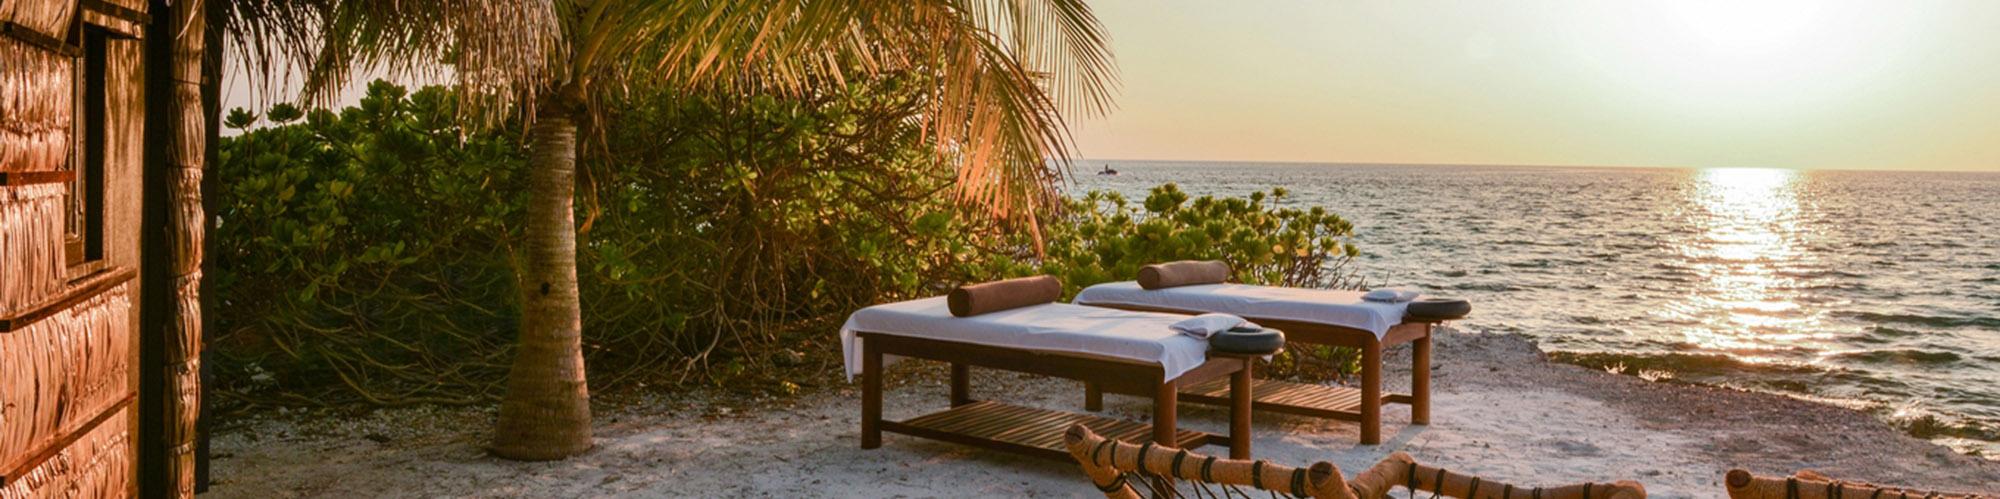 Adaaran Select Hudhuranfushi Hotel, Maldives